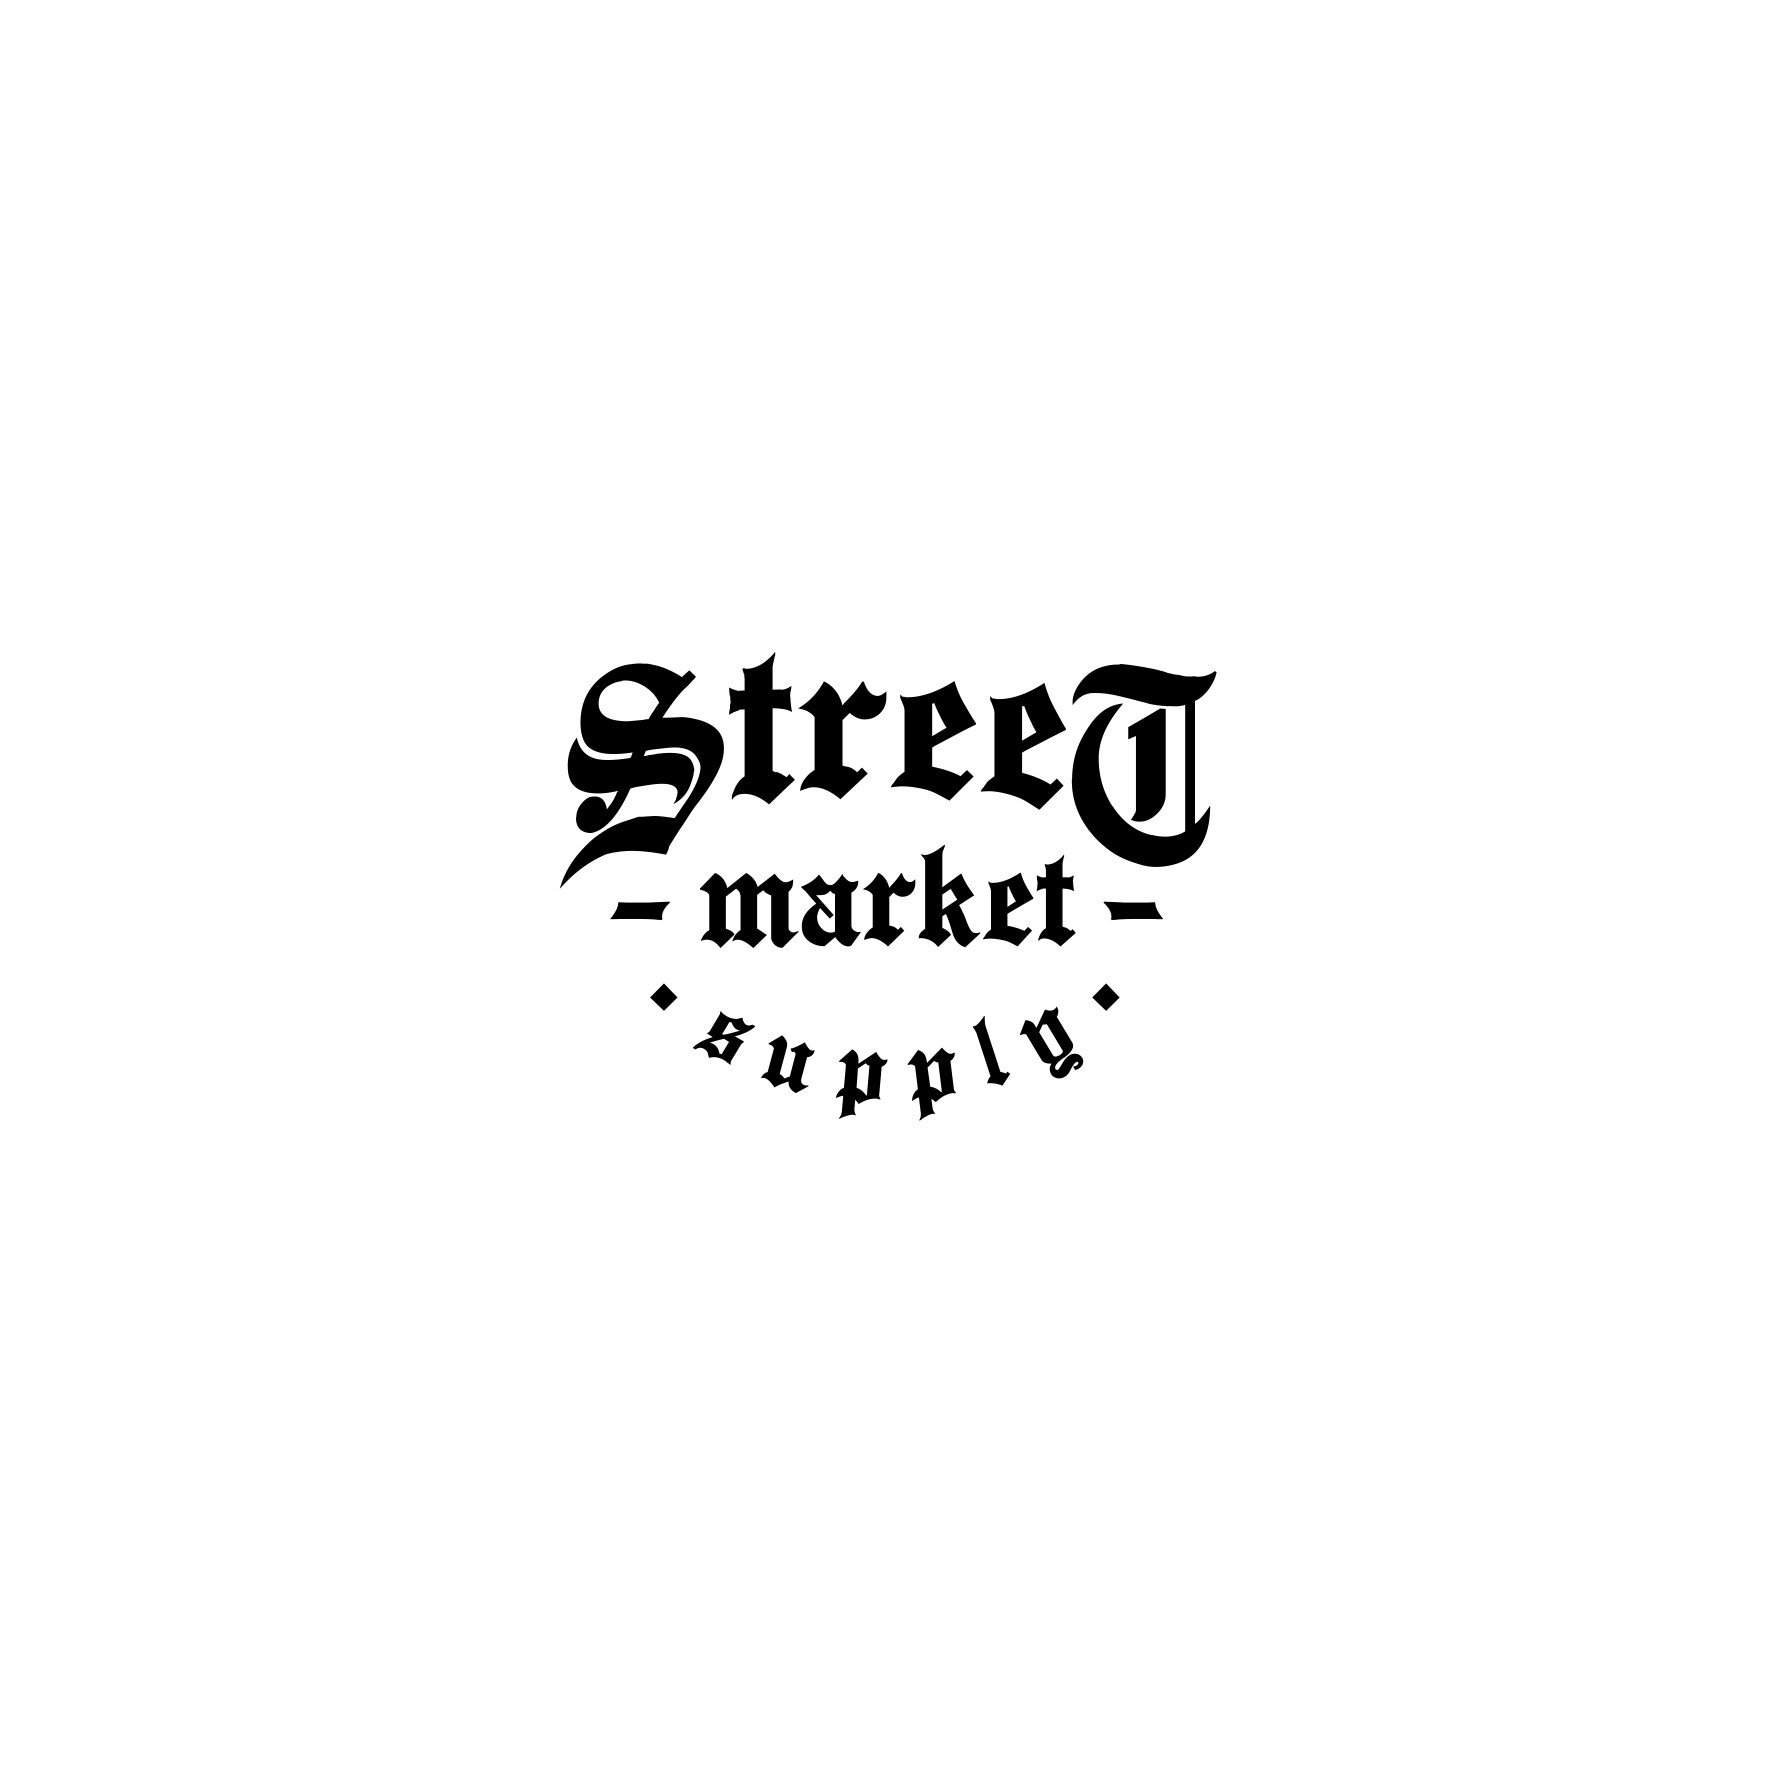 Logo Design for Streetwear Clothing Brand (Classic/Vintage/Bootleg Aesthetic)